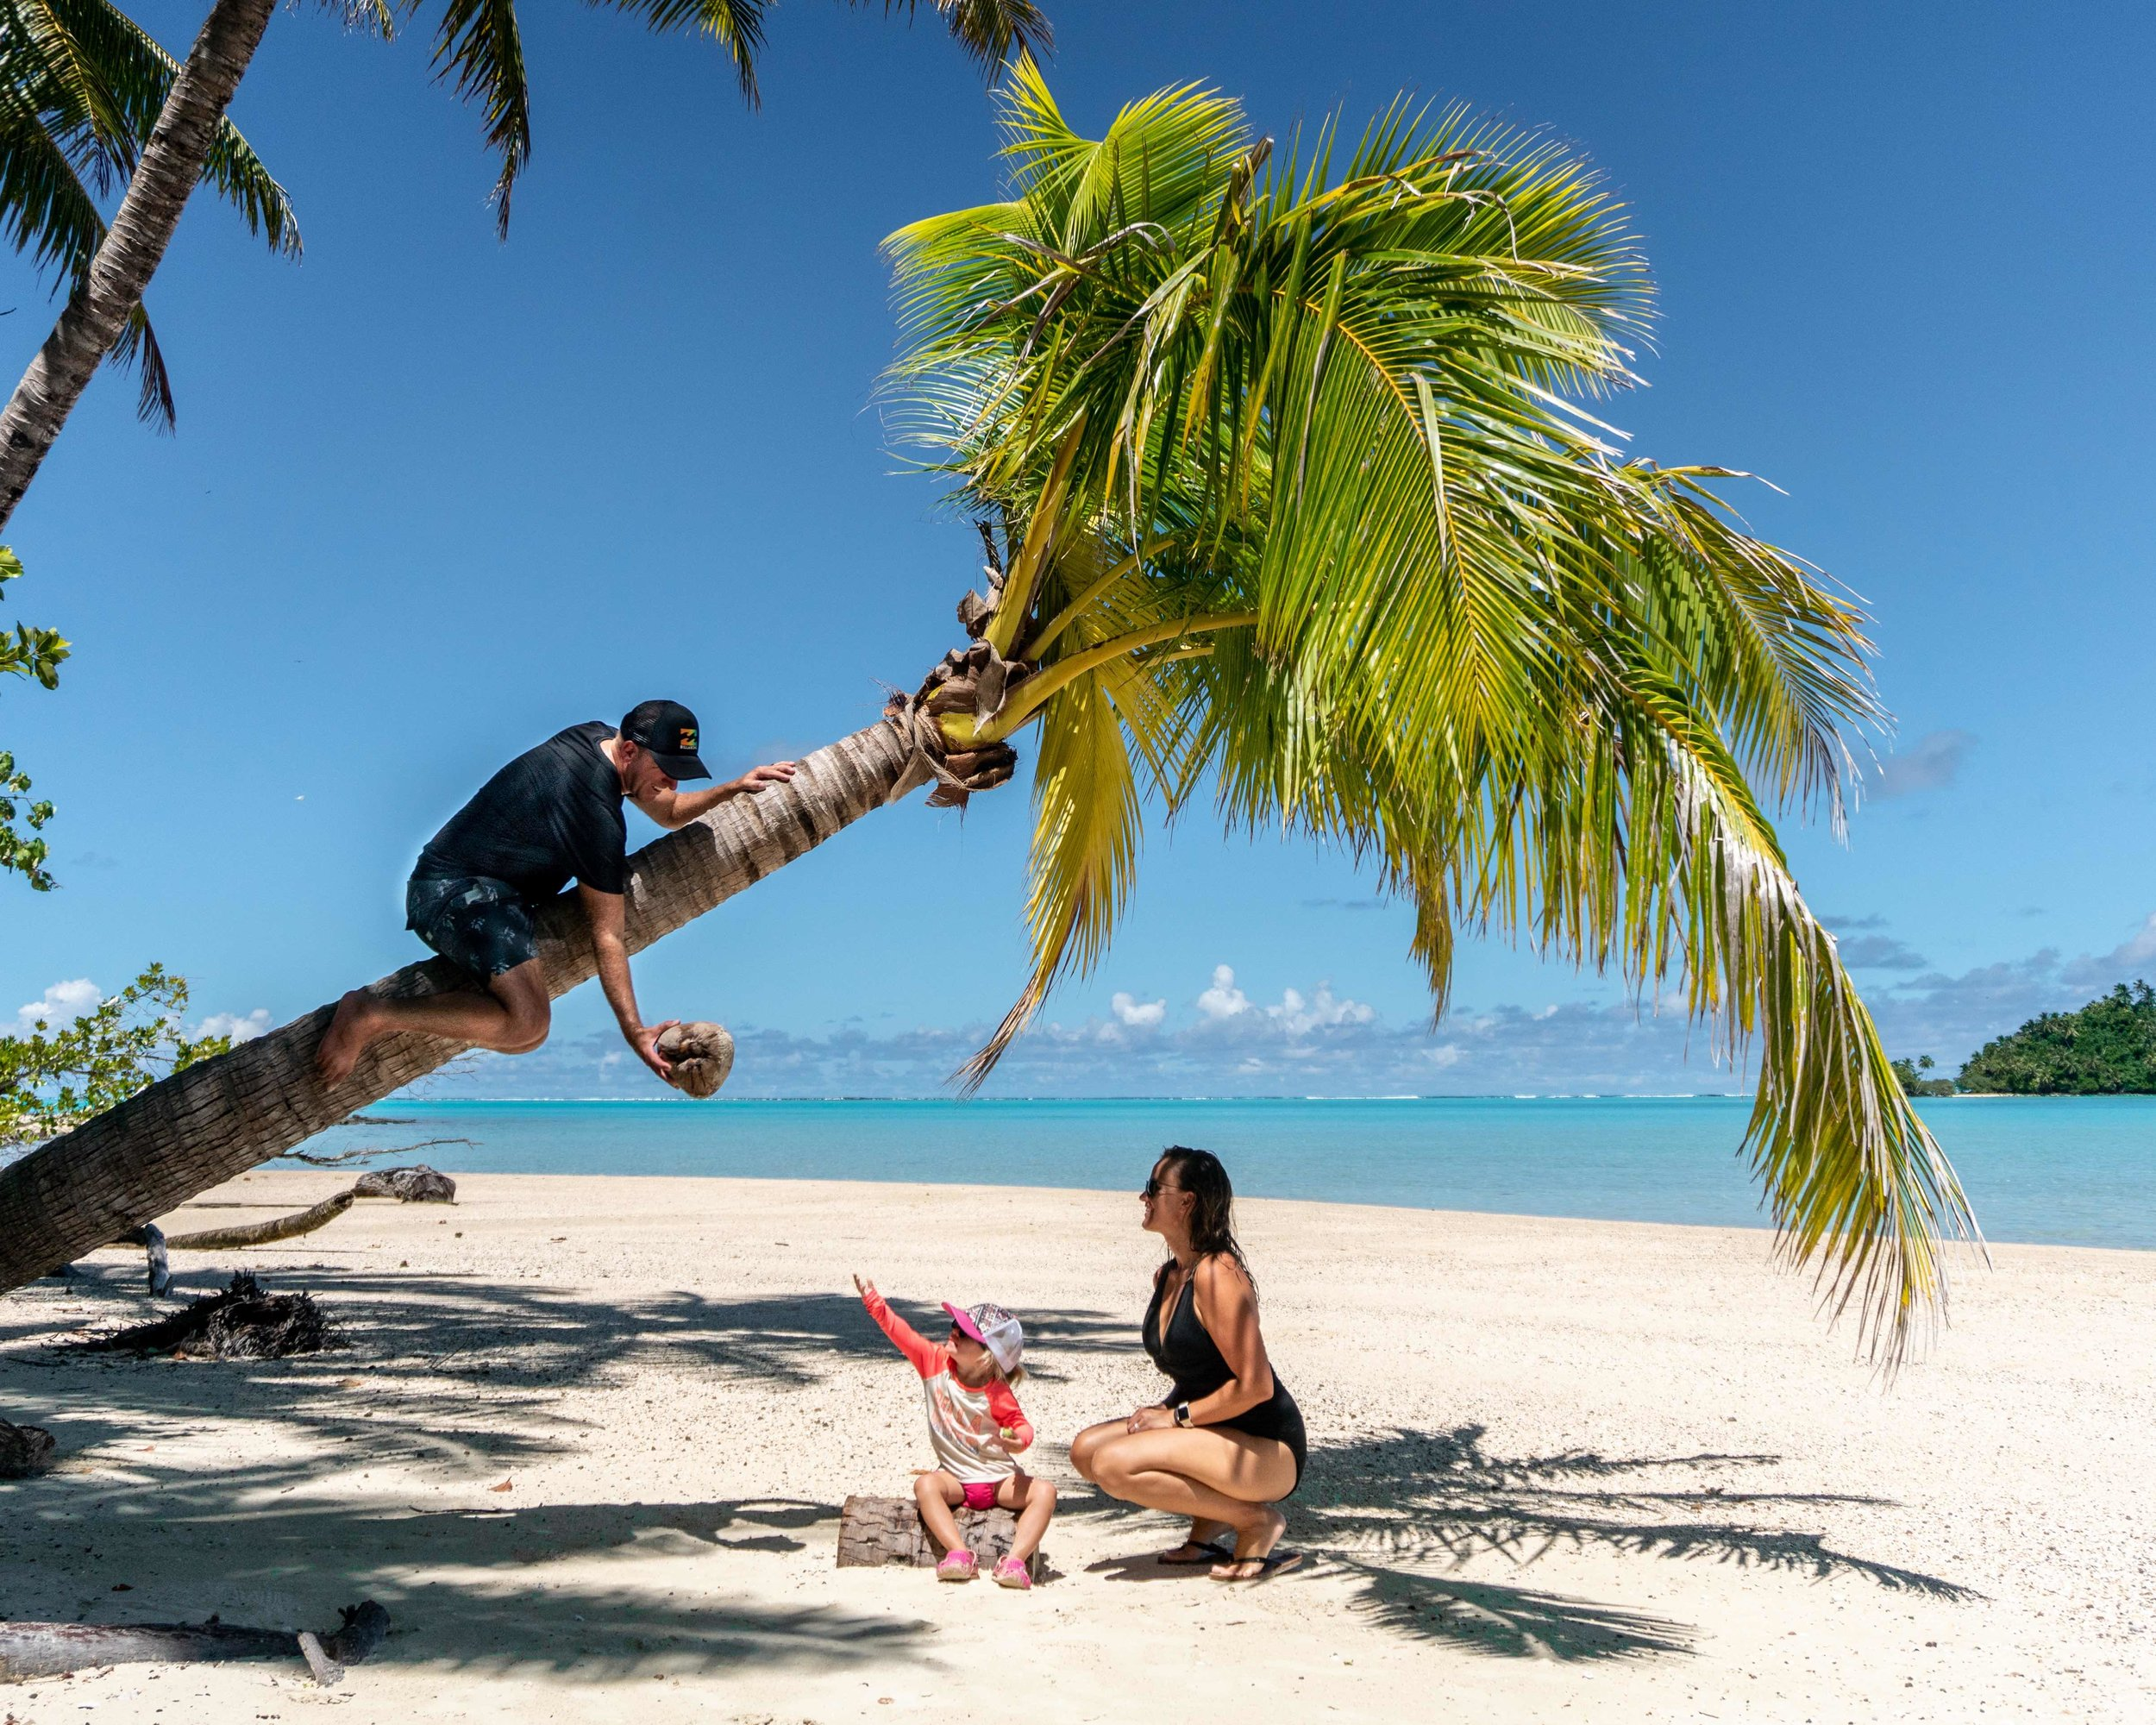 Island_Coconut_Palm tree_Beach_Family_Paradise_Cook Islands.jpg